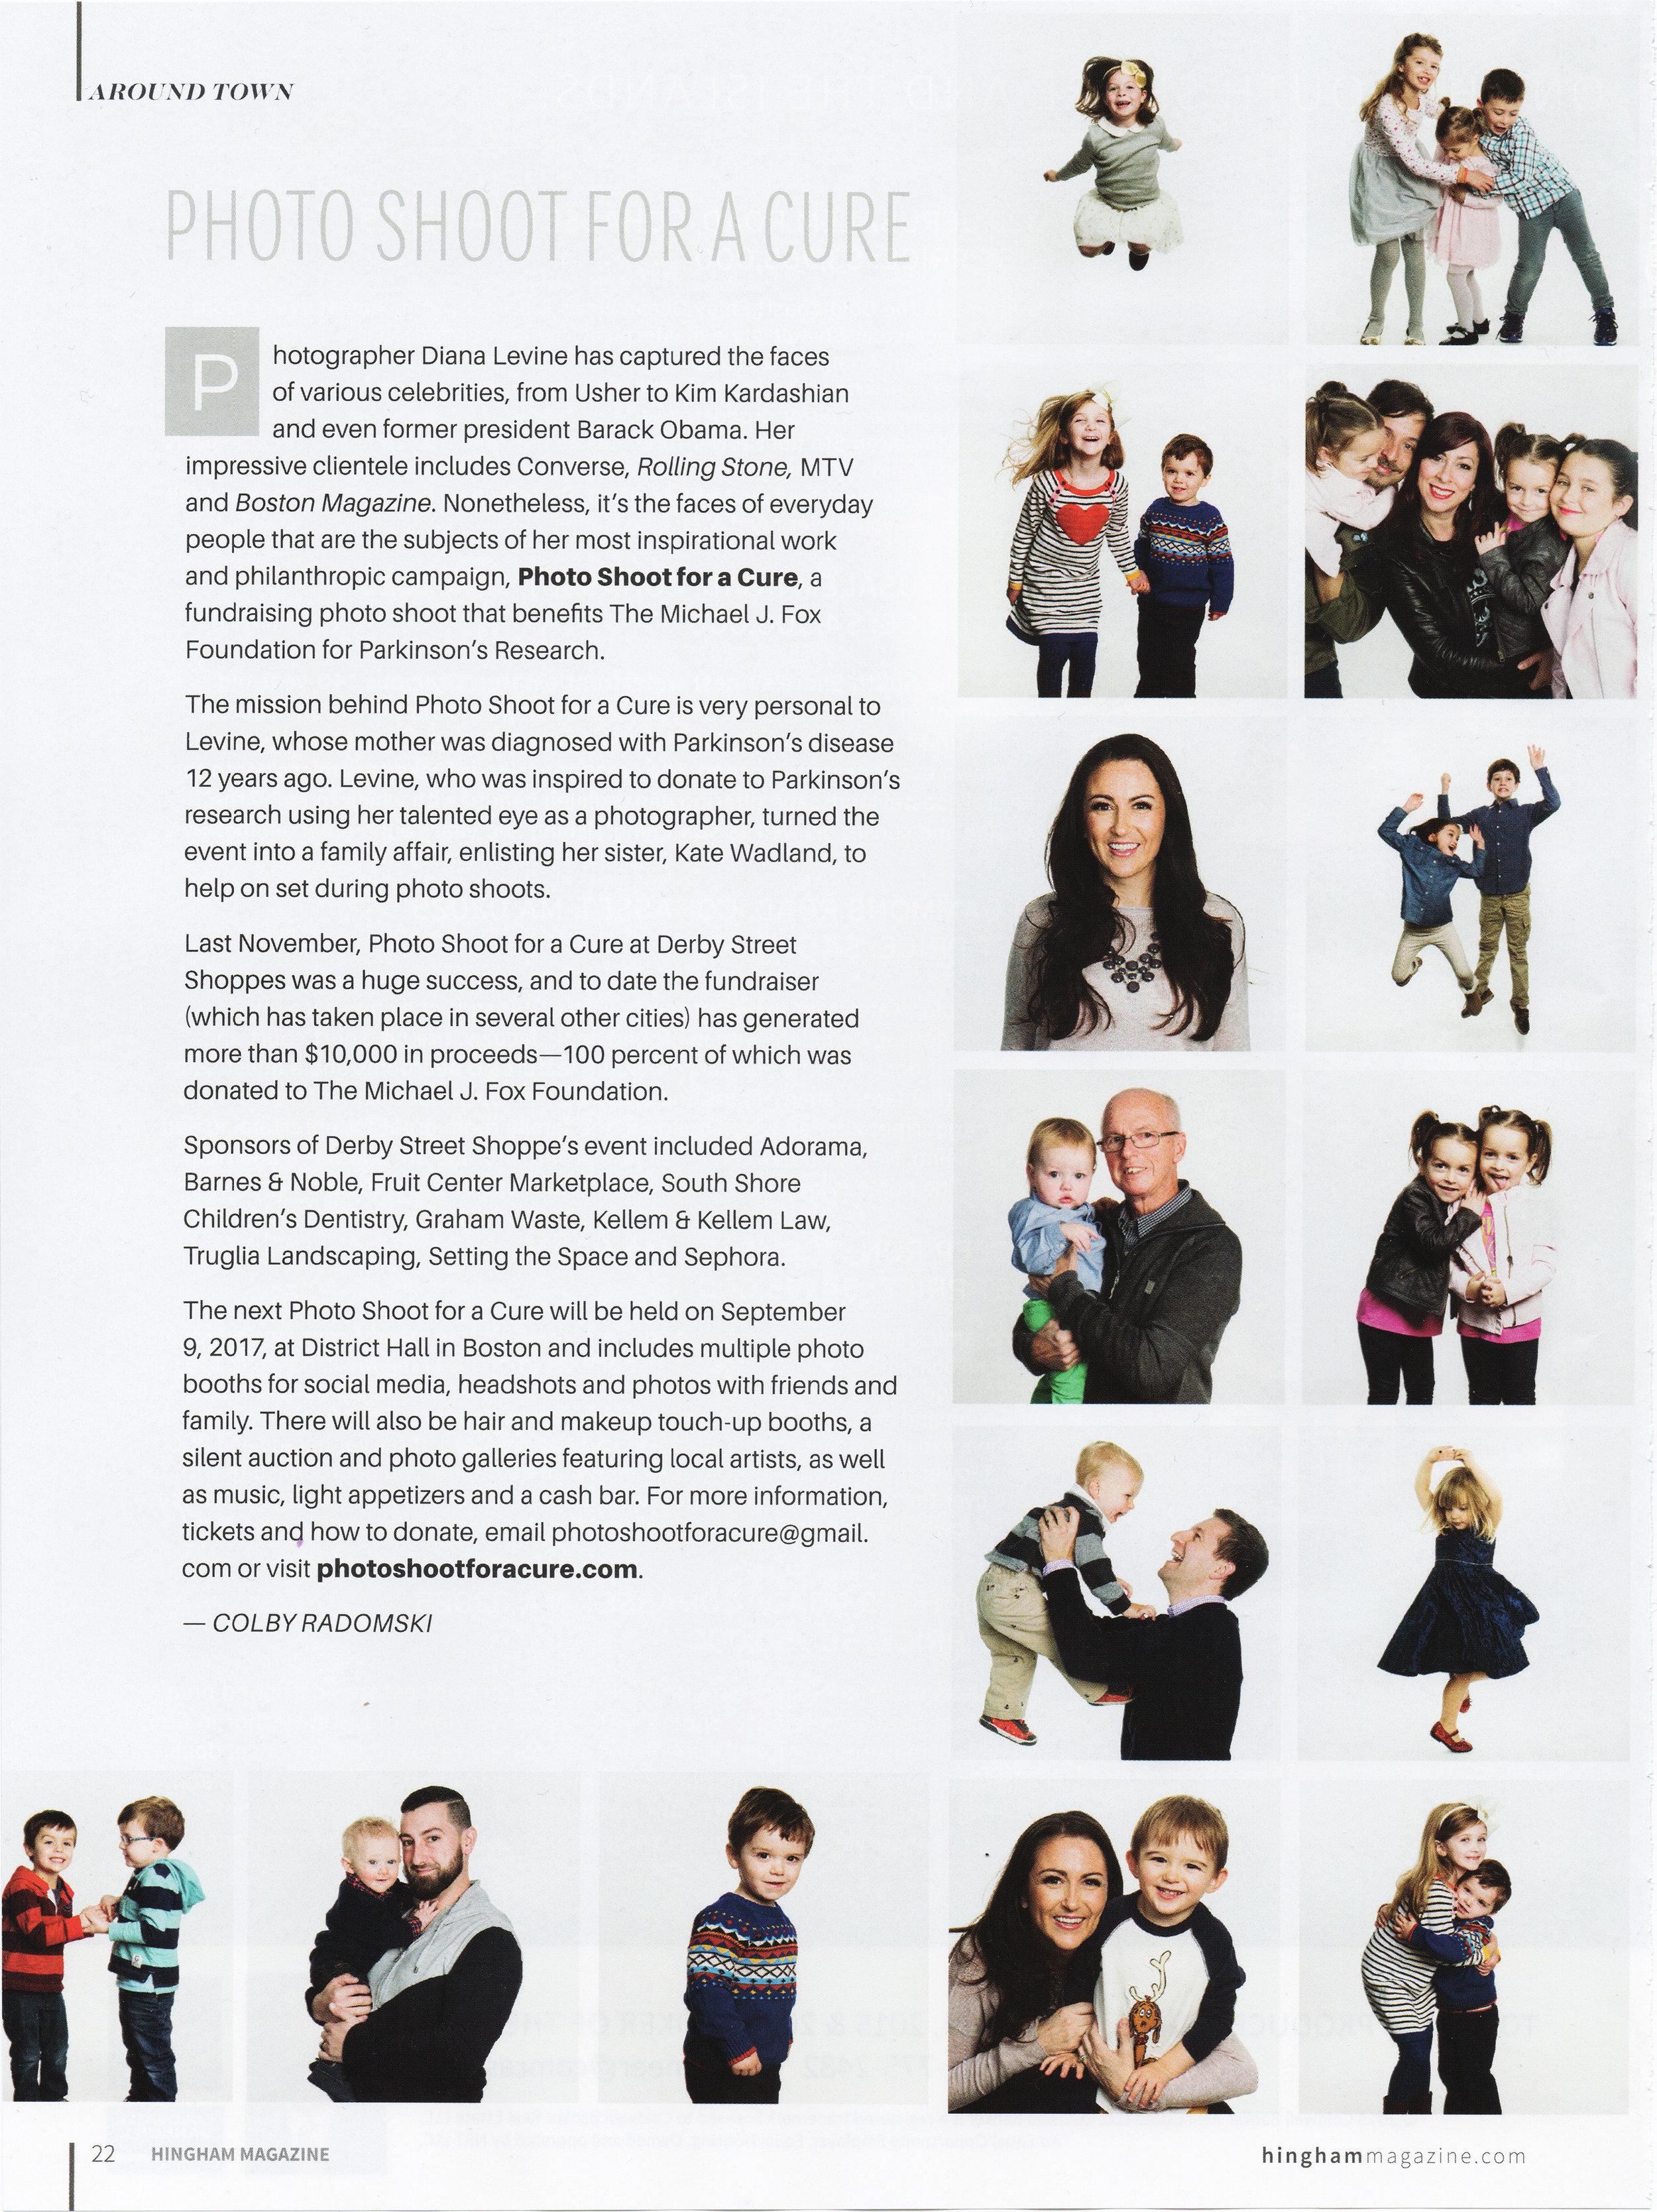 __HinghamMagazine-PhotoShootForACure.jpg